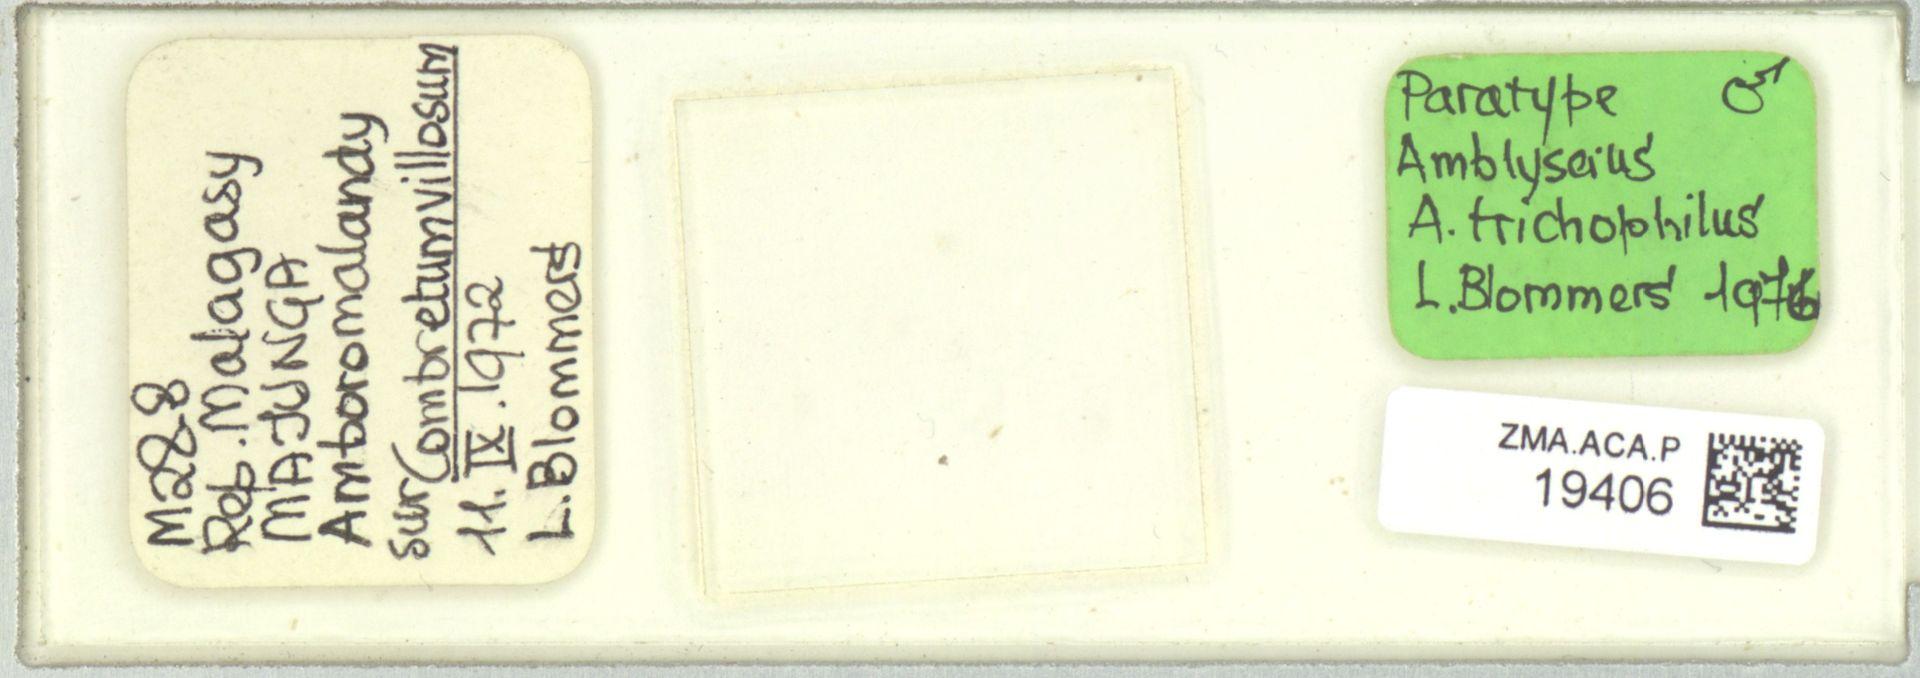 ZMA.ACA.P.19406 | Amblyseius (Amblyseius) trichophilus Blommers, 1976